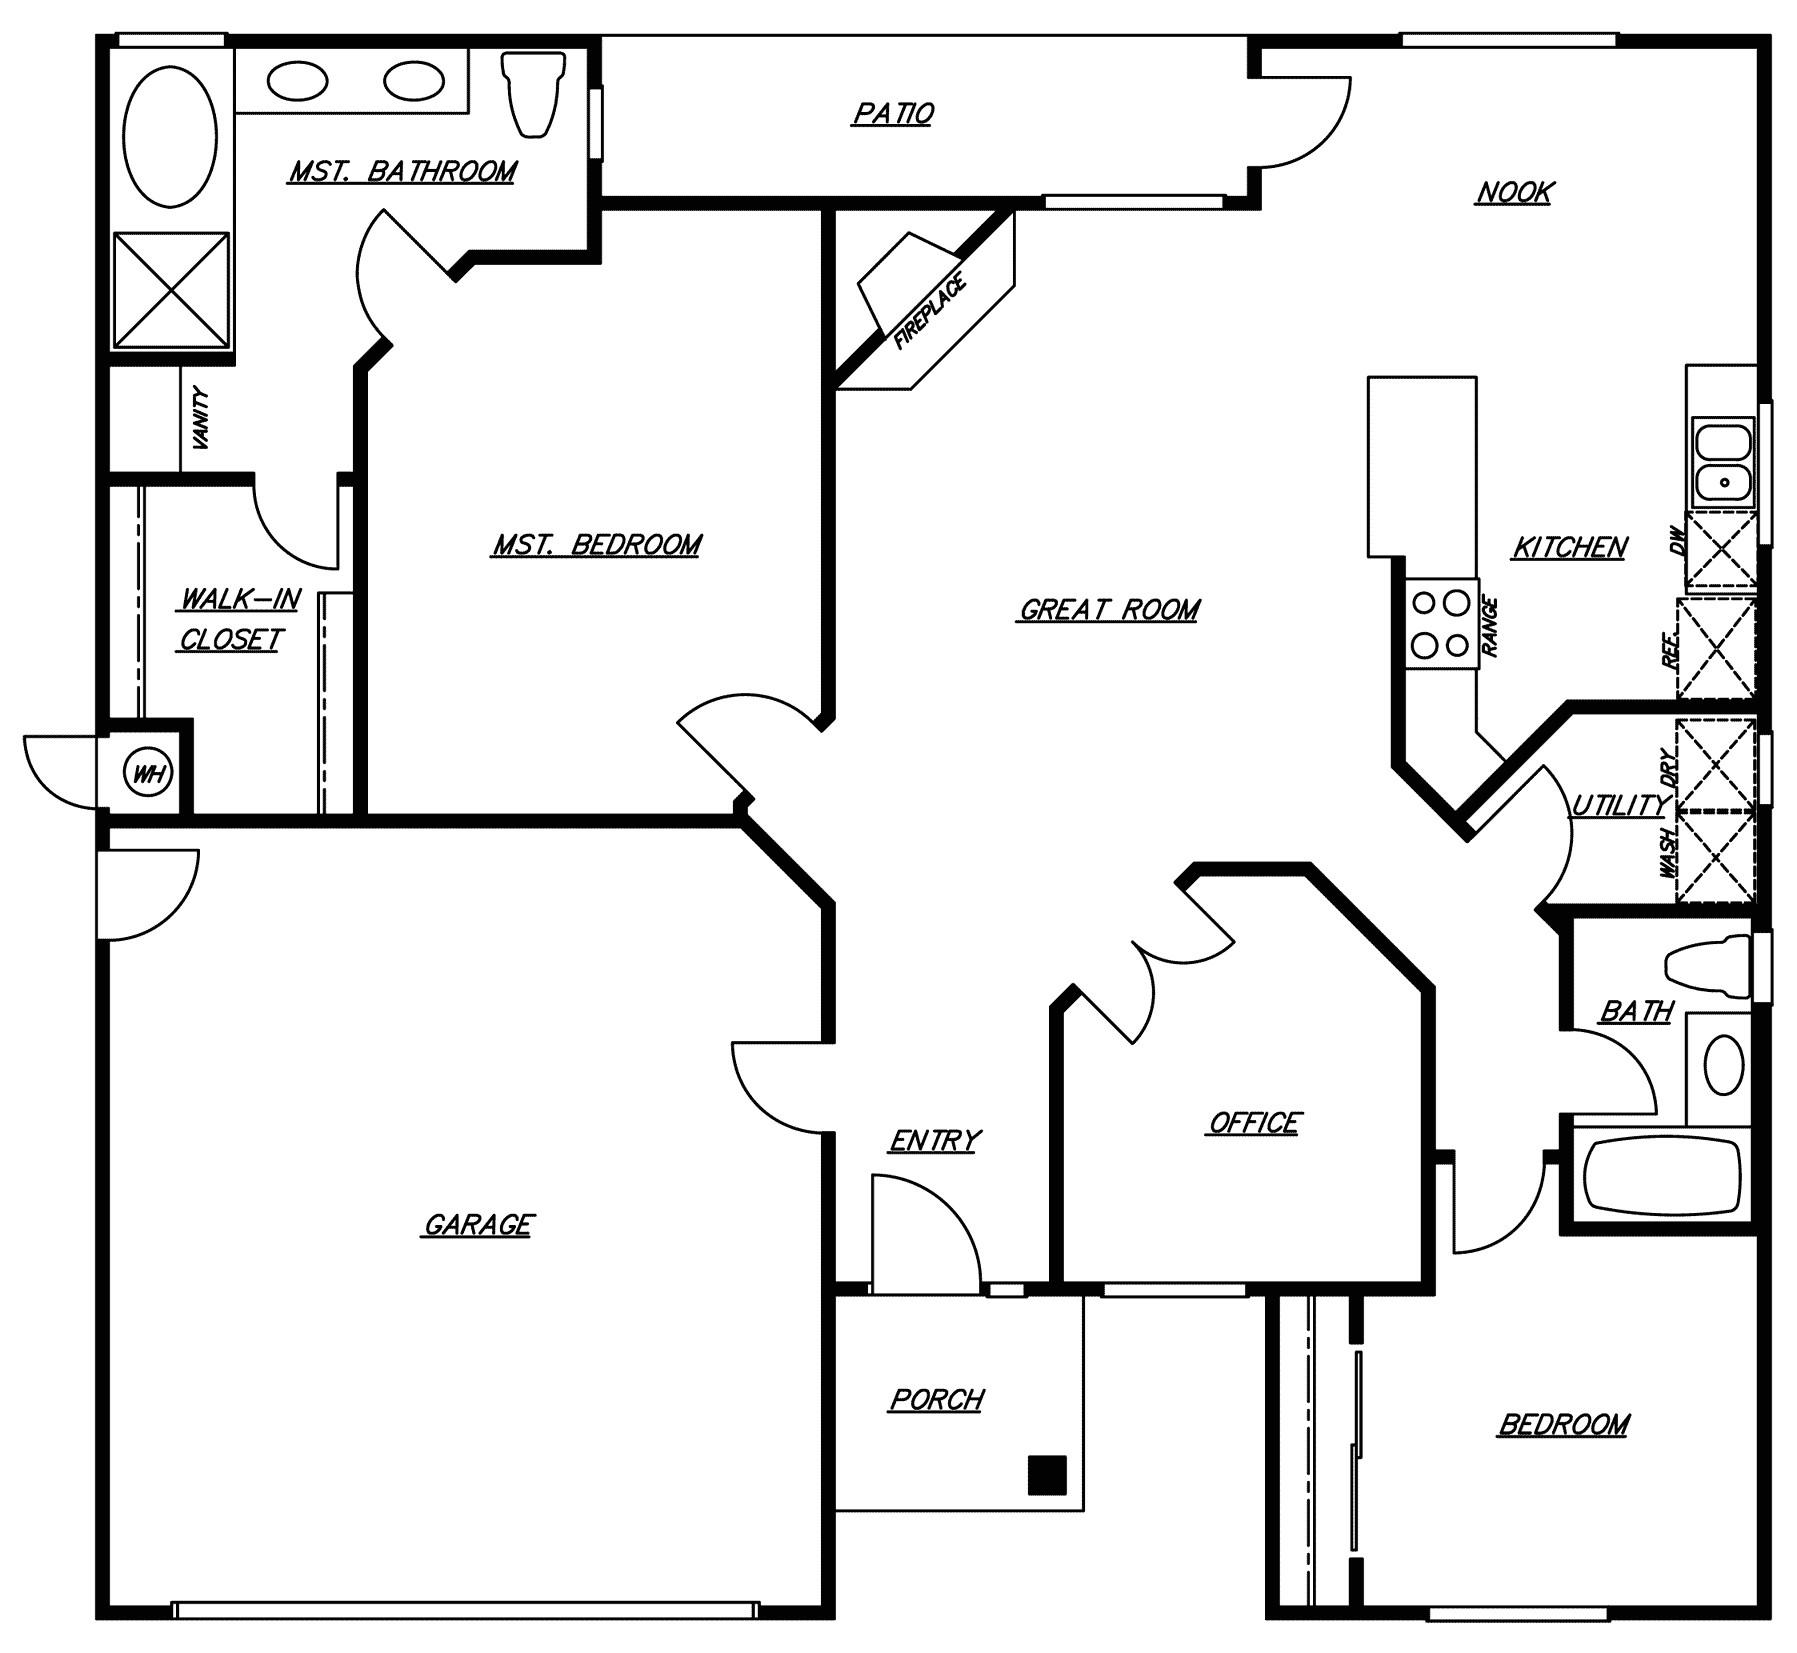 lustron homes floor plans elegant house plan fresh national housing authority zambia house plans